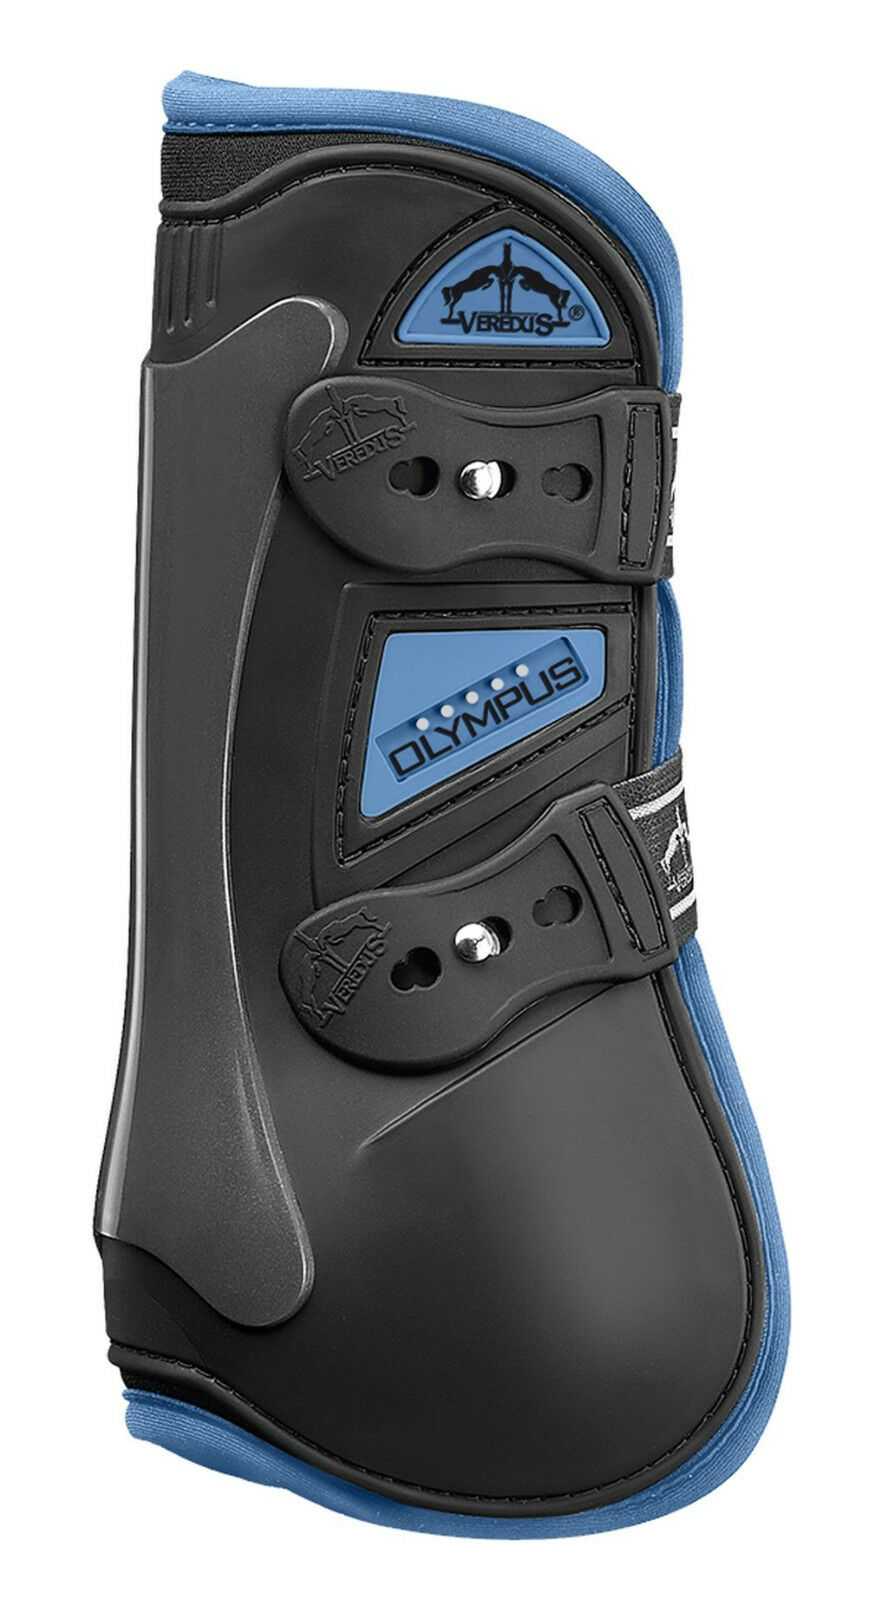 VeROTus NEUES Farbe Edition Gamaschen-Set Olympus Front + Rear NEUES VeROTus DESIGN 4be21d